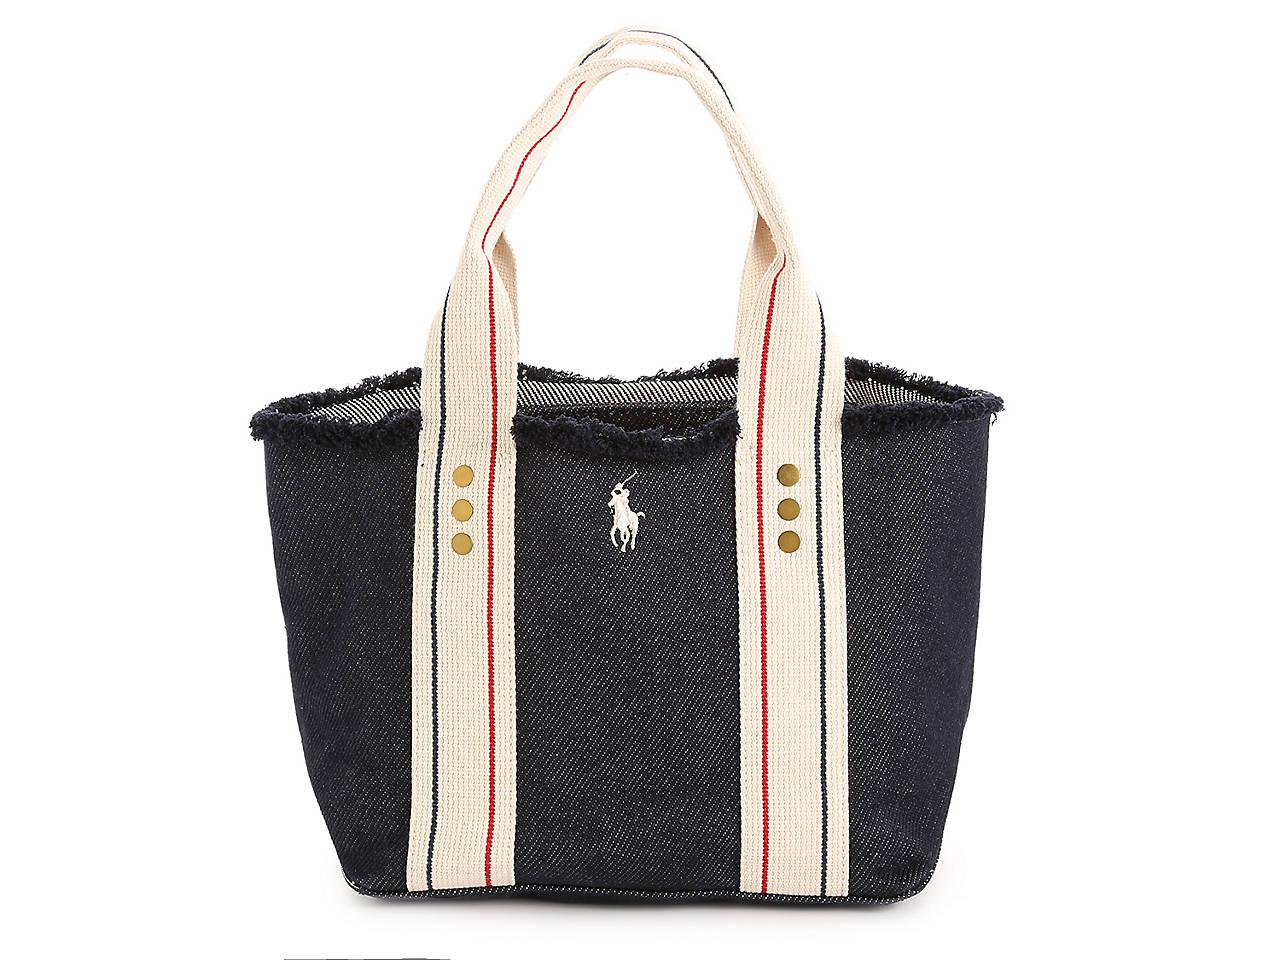 d16c30da5b60 Polo Ralph Lauren Frayed Mini Tote Women s Handbags   Accessories